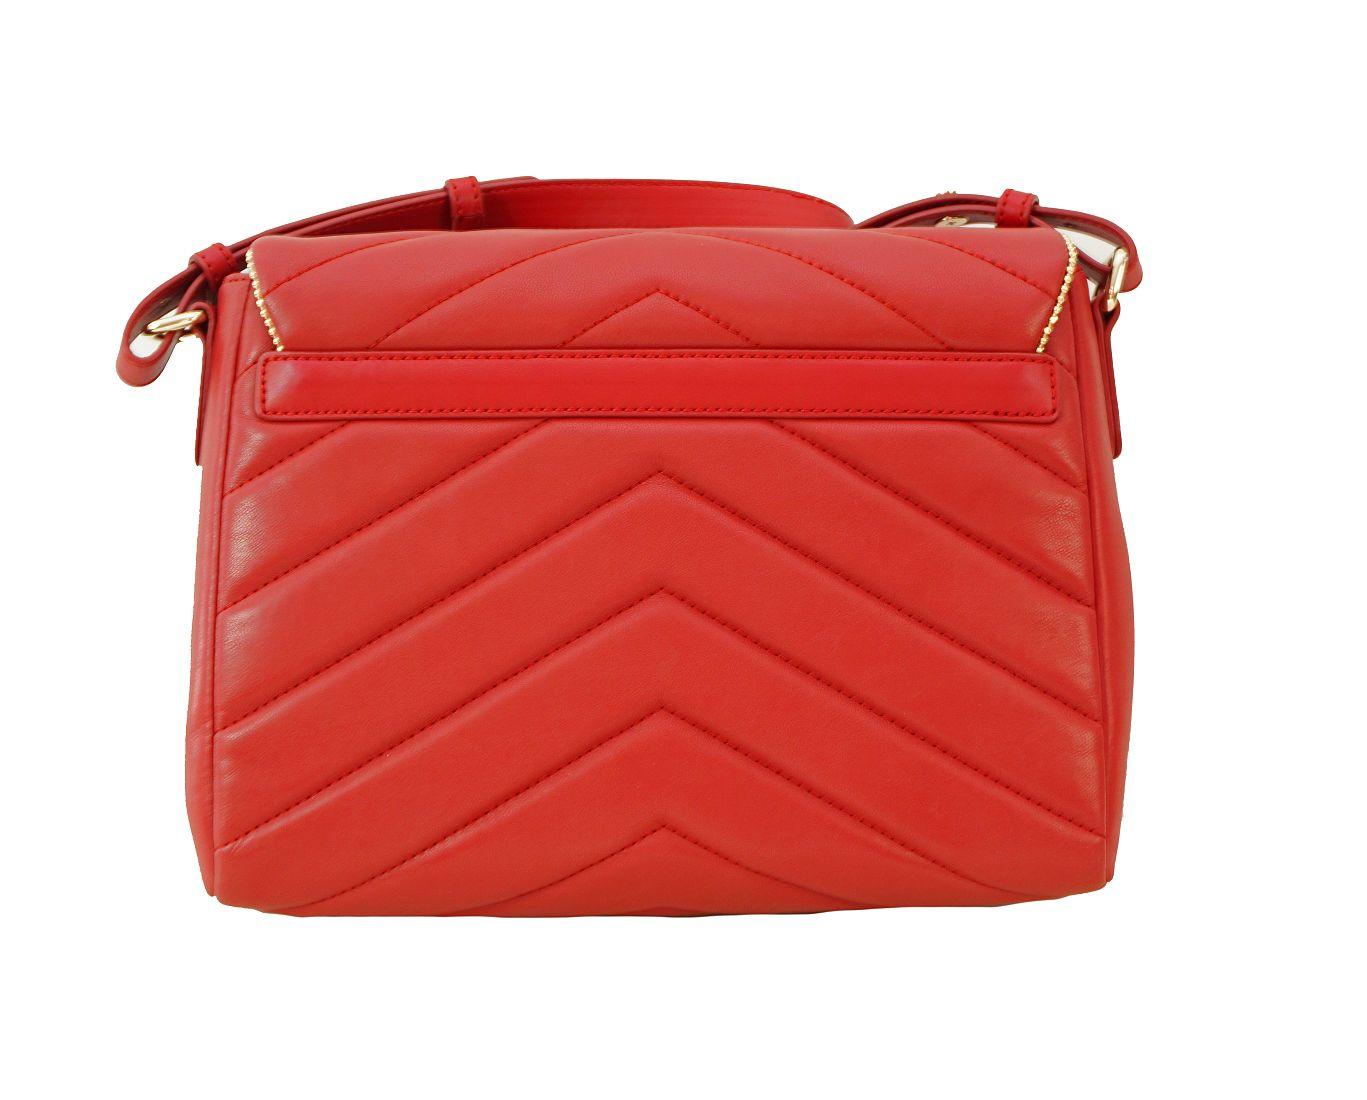 Armani Jeans Tasche Handtasche f. Damen 922159 6A718 00176 Bordeaux HW16